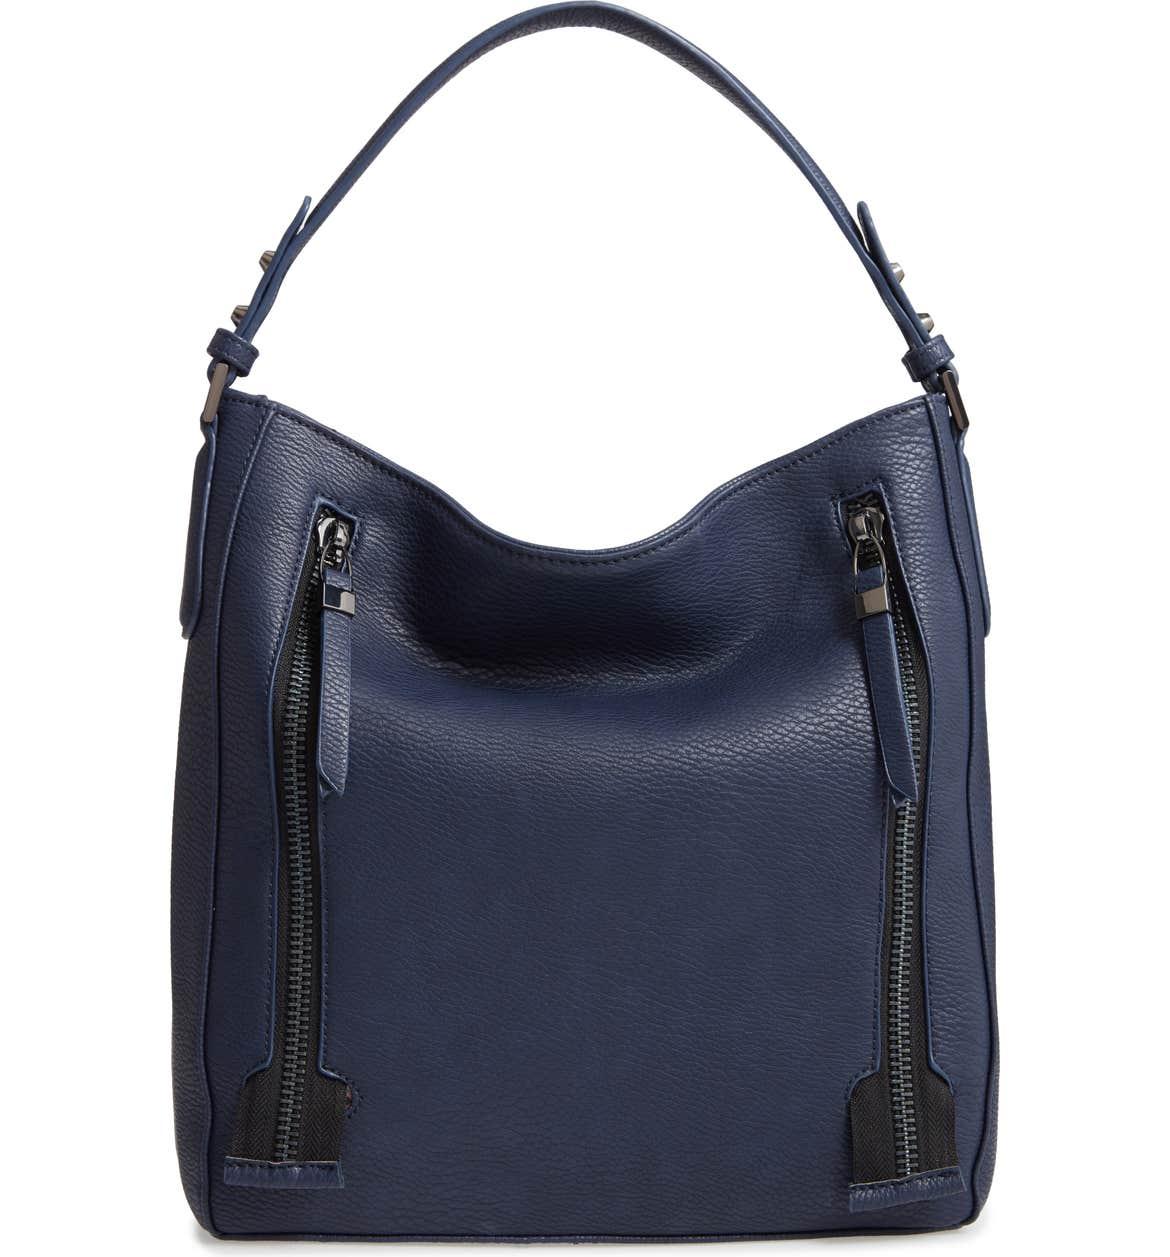 SONDRA ROBERTS Faux Leather Hobo, Main, color, NAVY